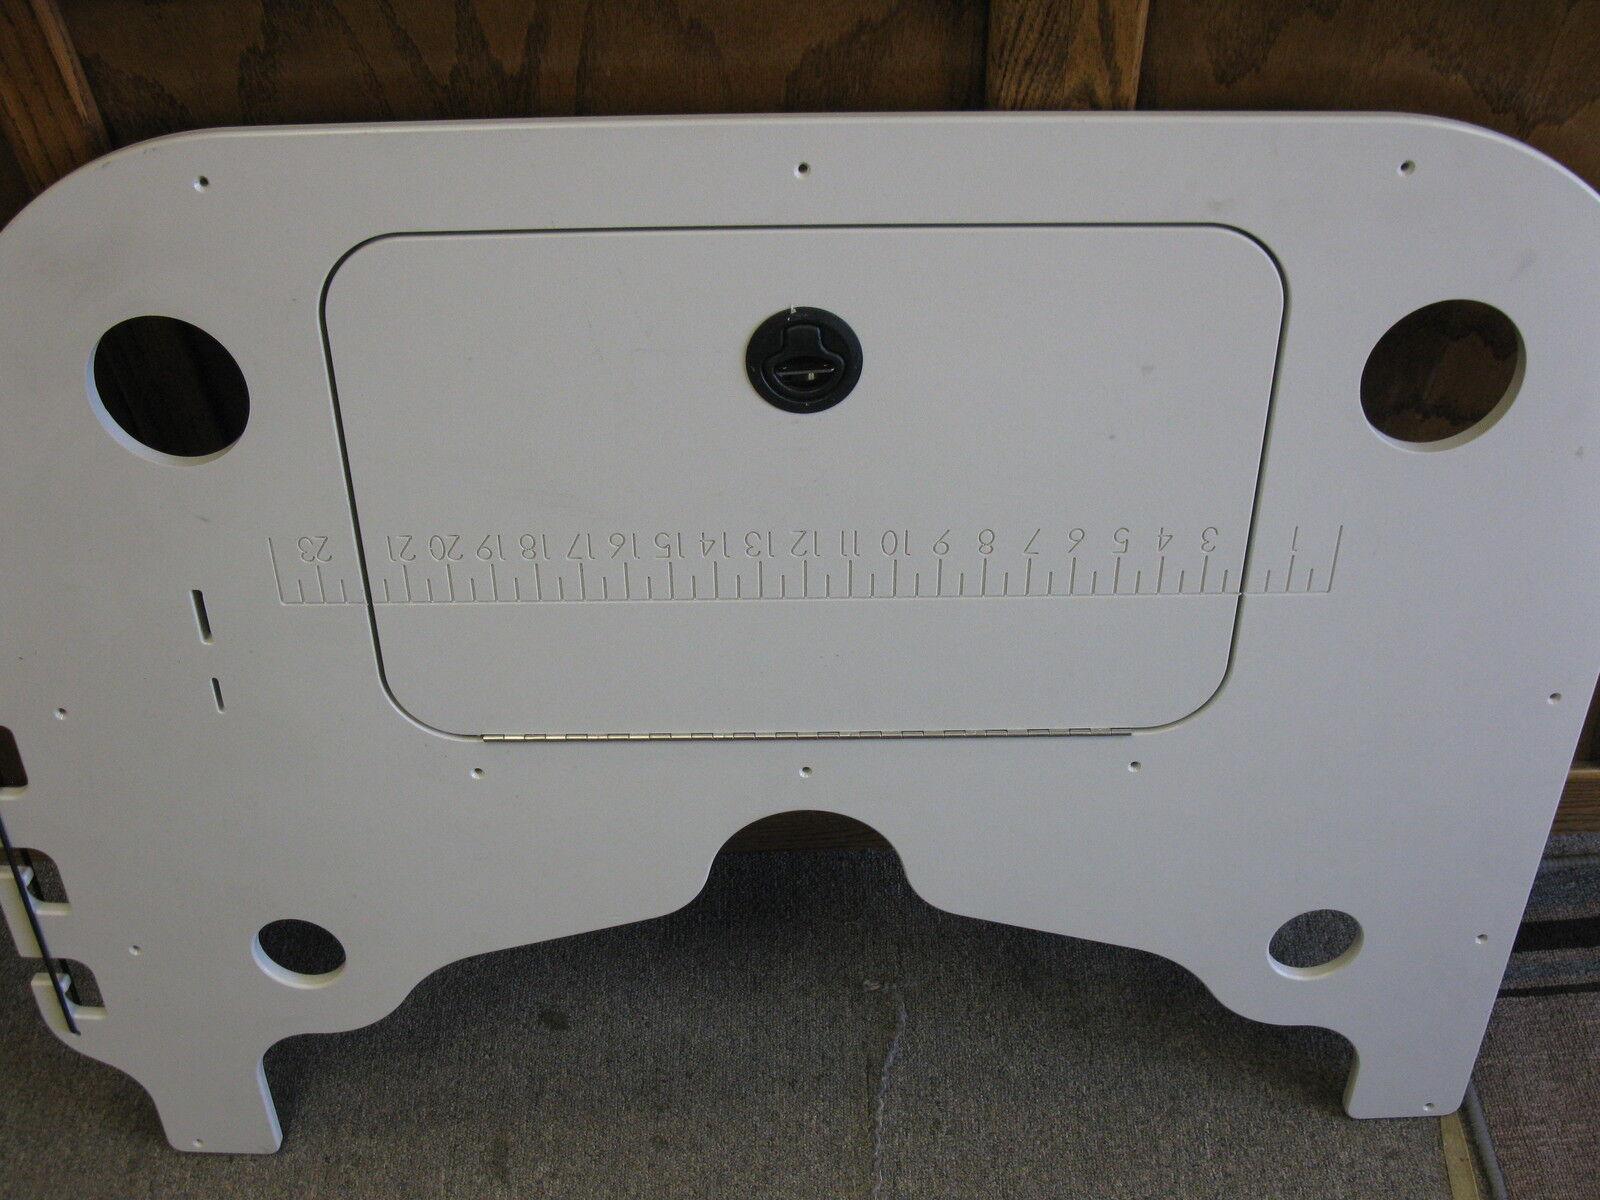 Suncather boat fishing console has cutting table tan 46 46 tan inches long f1e337